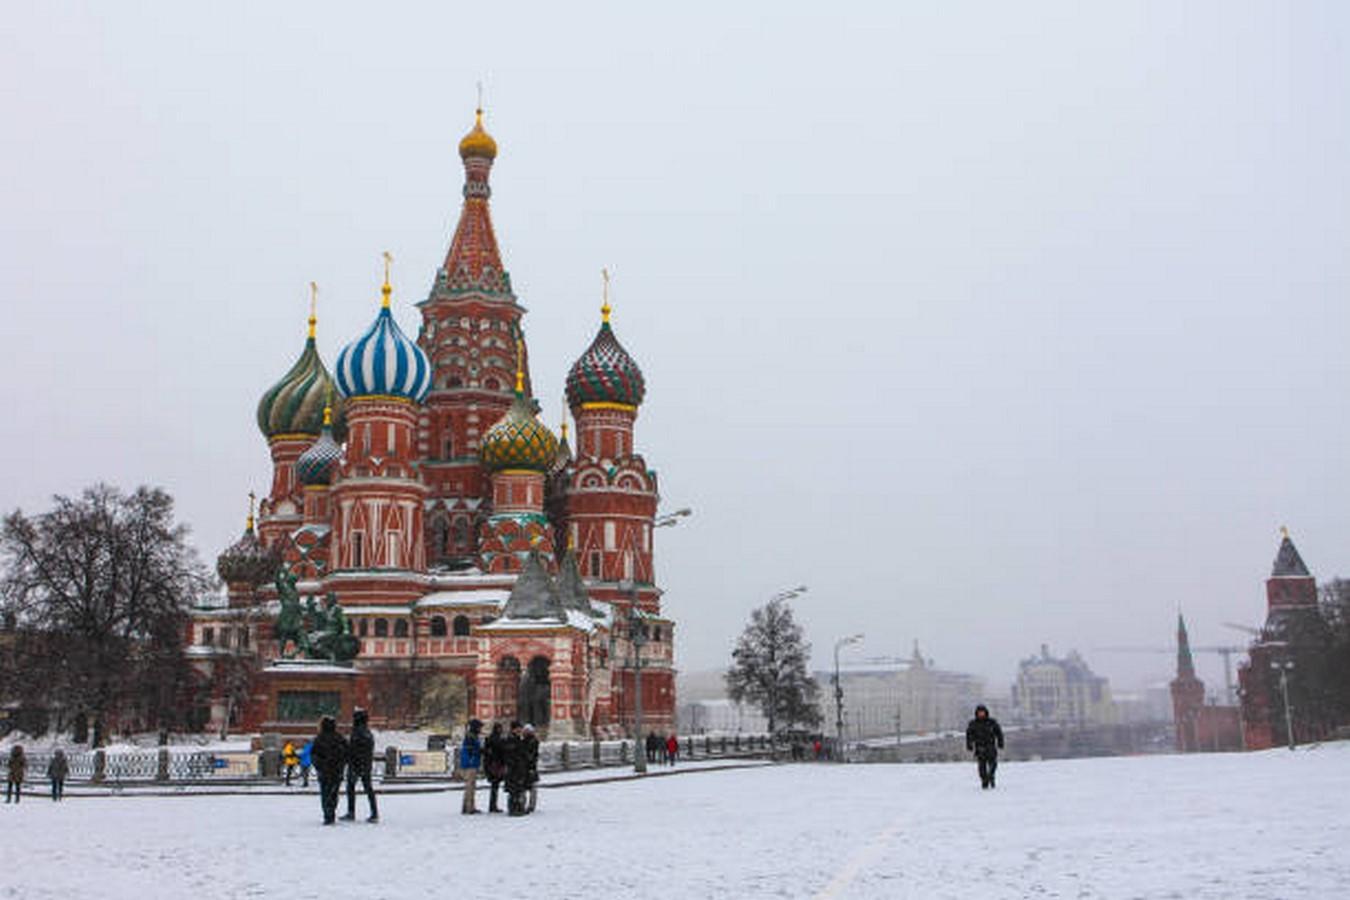 Basil's Cathedral by Pestnik Yakolev and Ivan Barma - Sheet3